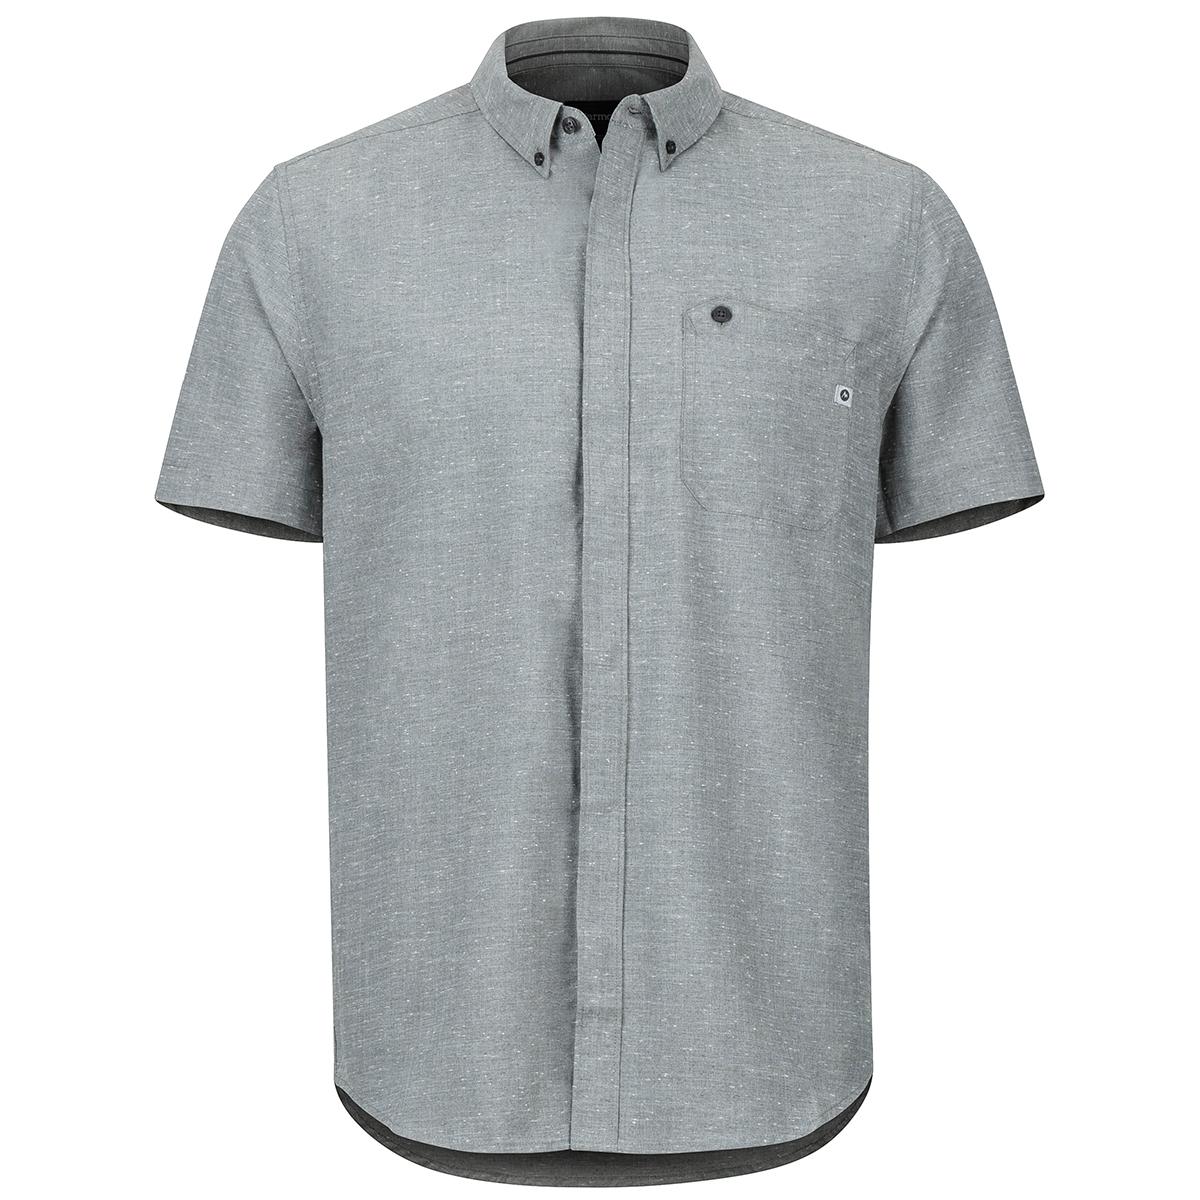 Marmot Men's Cooper Canyon Short-Sleeve Shirt - Black, M